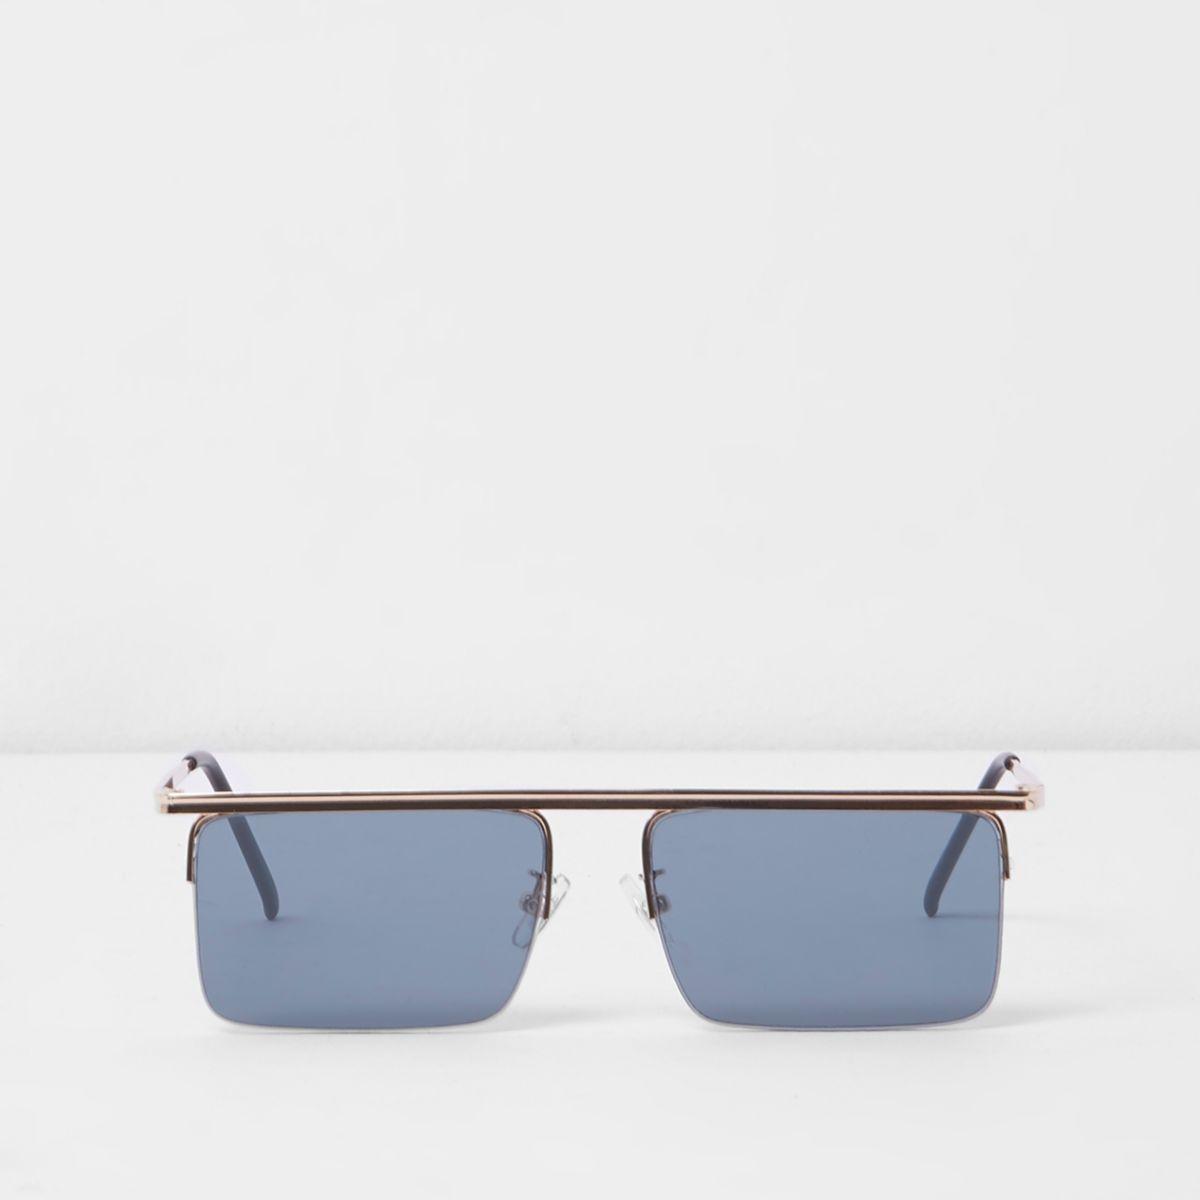 Gold tone smoke lens square visor sunglasses